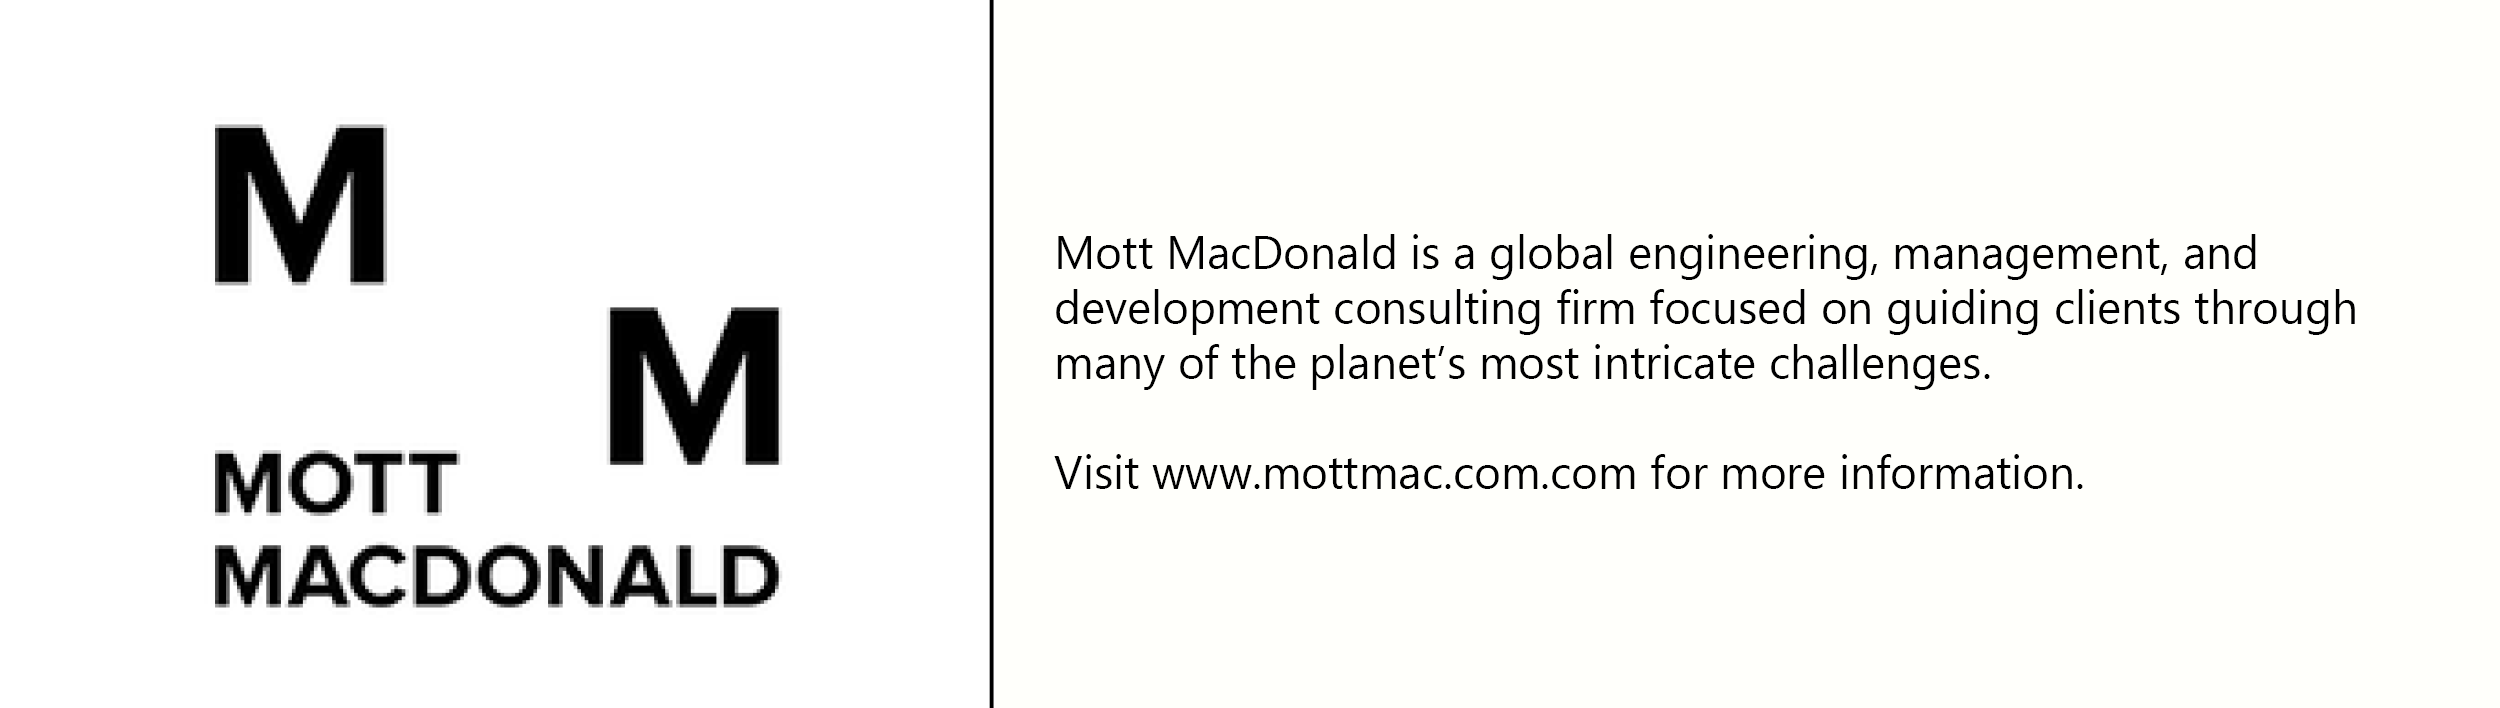 Mott macdonald  logo with description of company